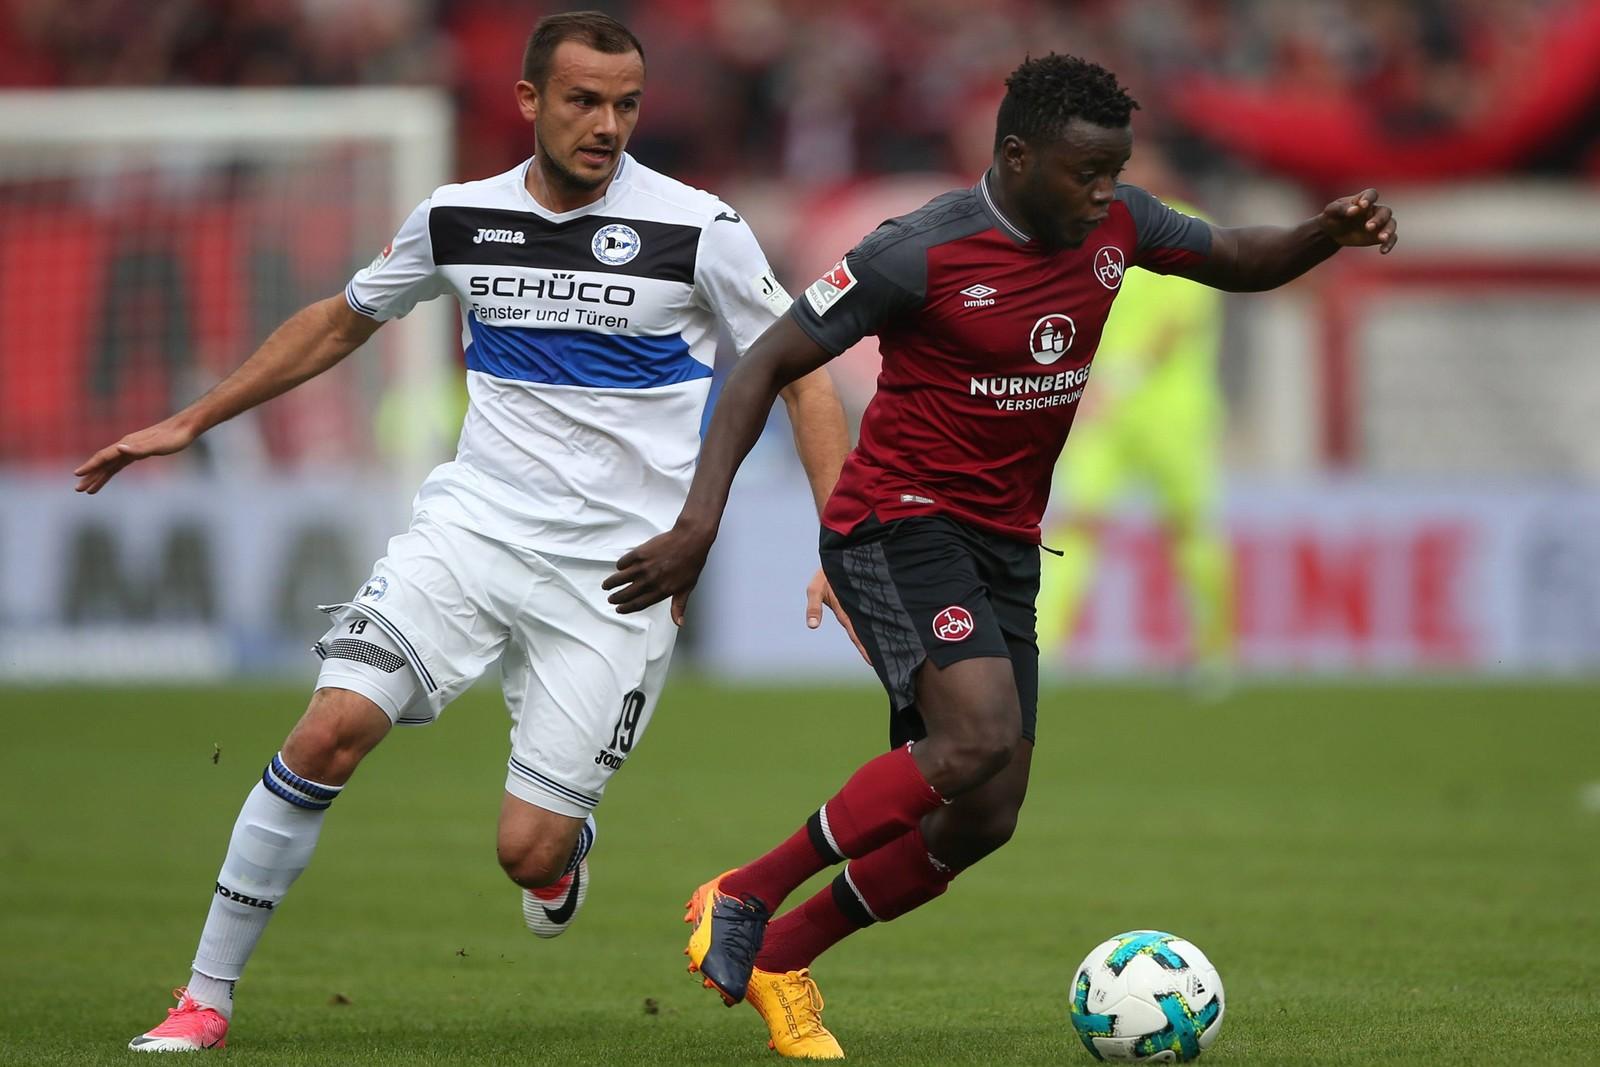 Edgar Salli vom 1. FC Nürnberg gegen Manuel Prietl von Arminia Bielefeld